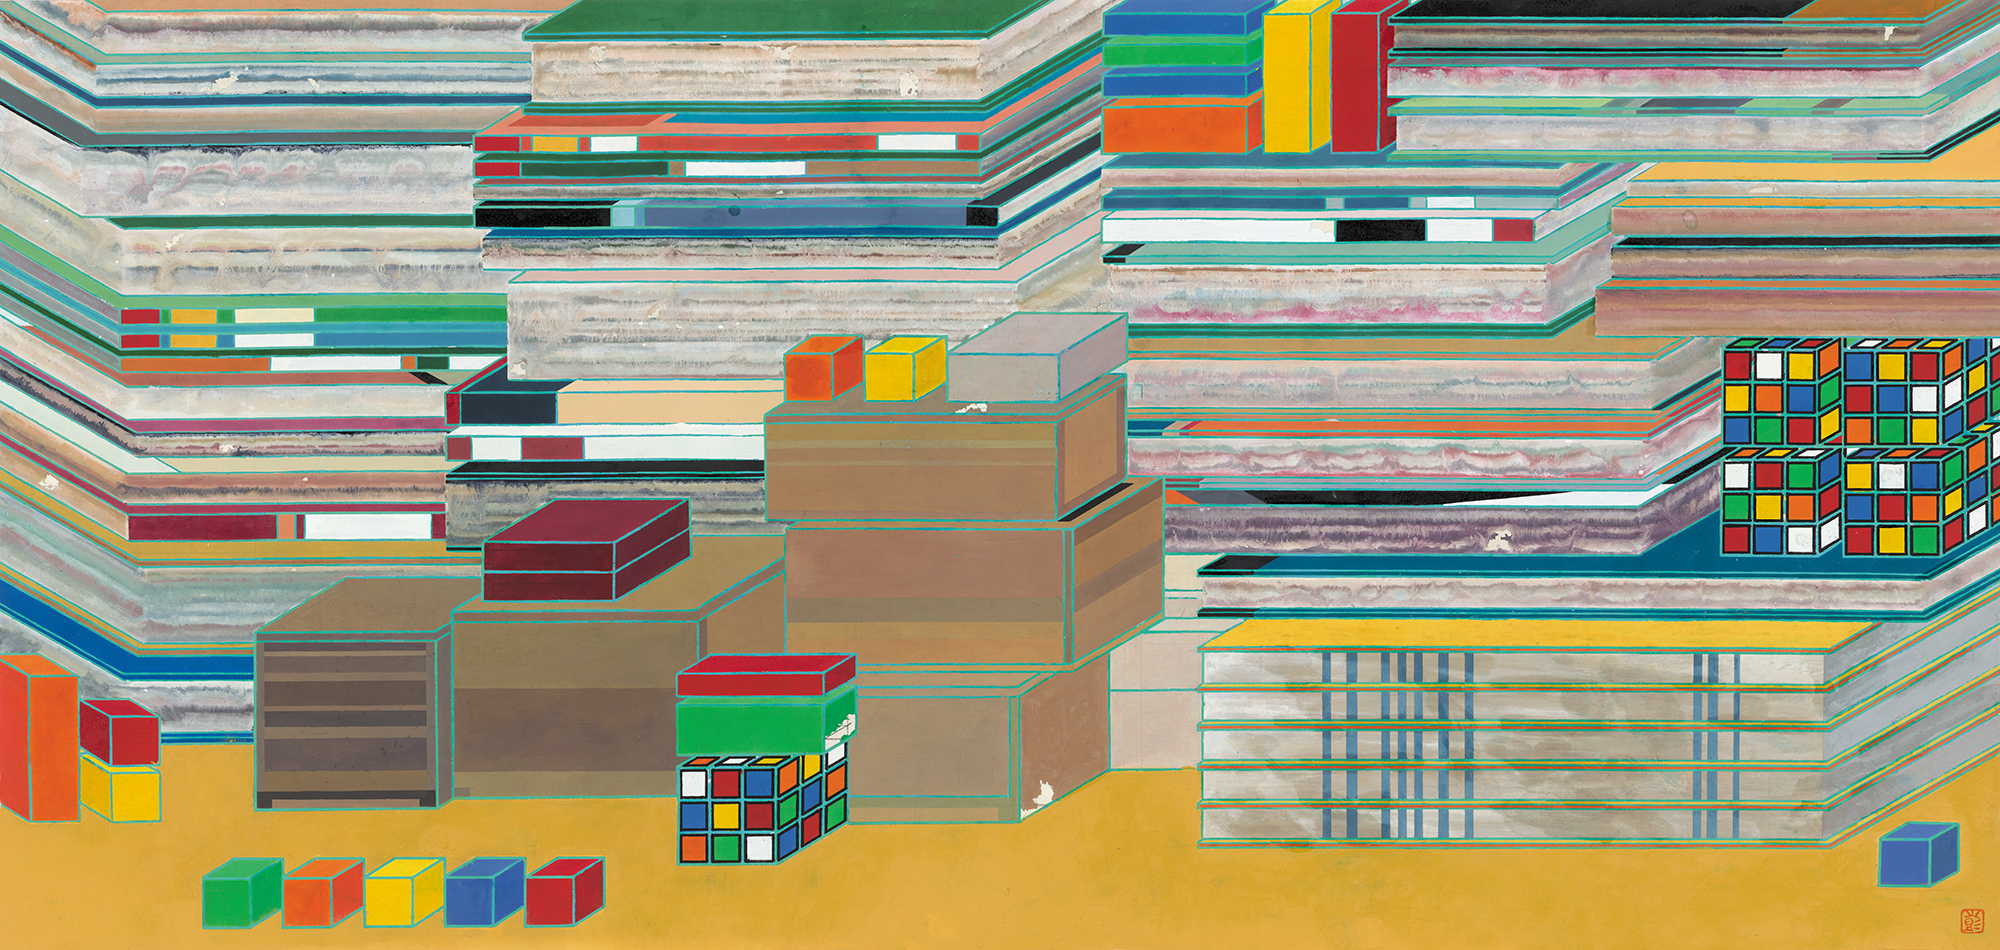 Peng Jian 彭剑, 置物, 2015, Ink and color on rice paper 纸本设色, 124 × 58 cm